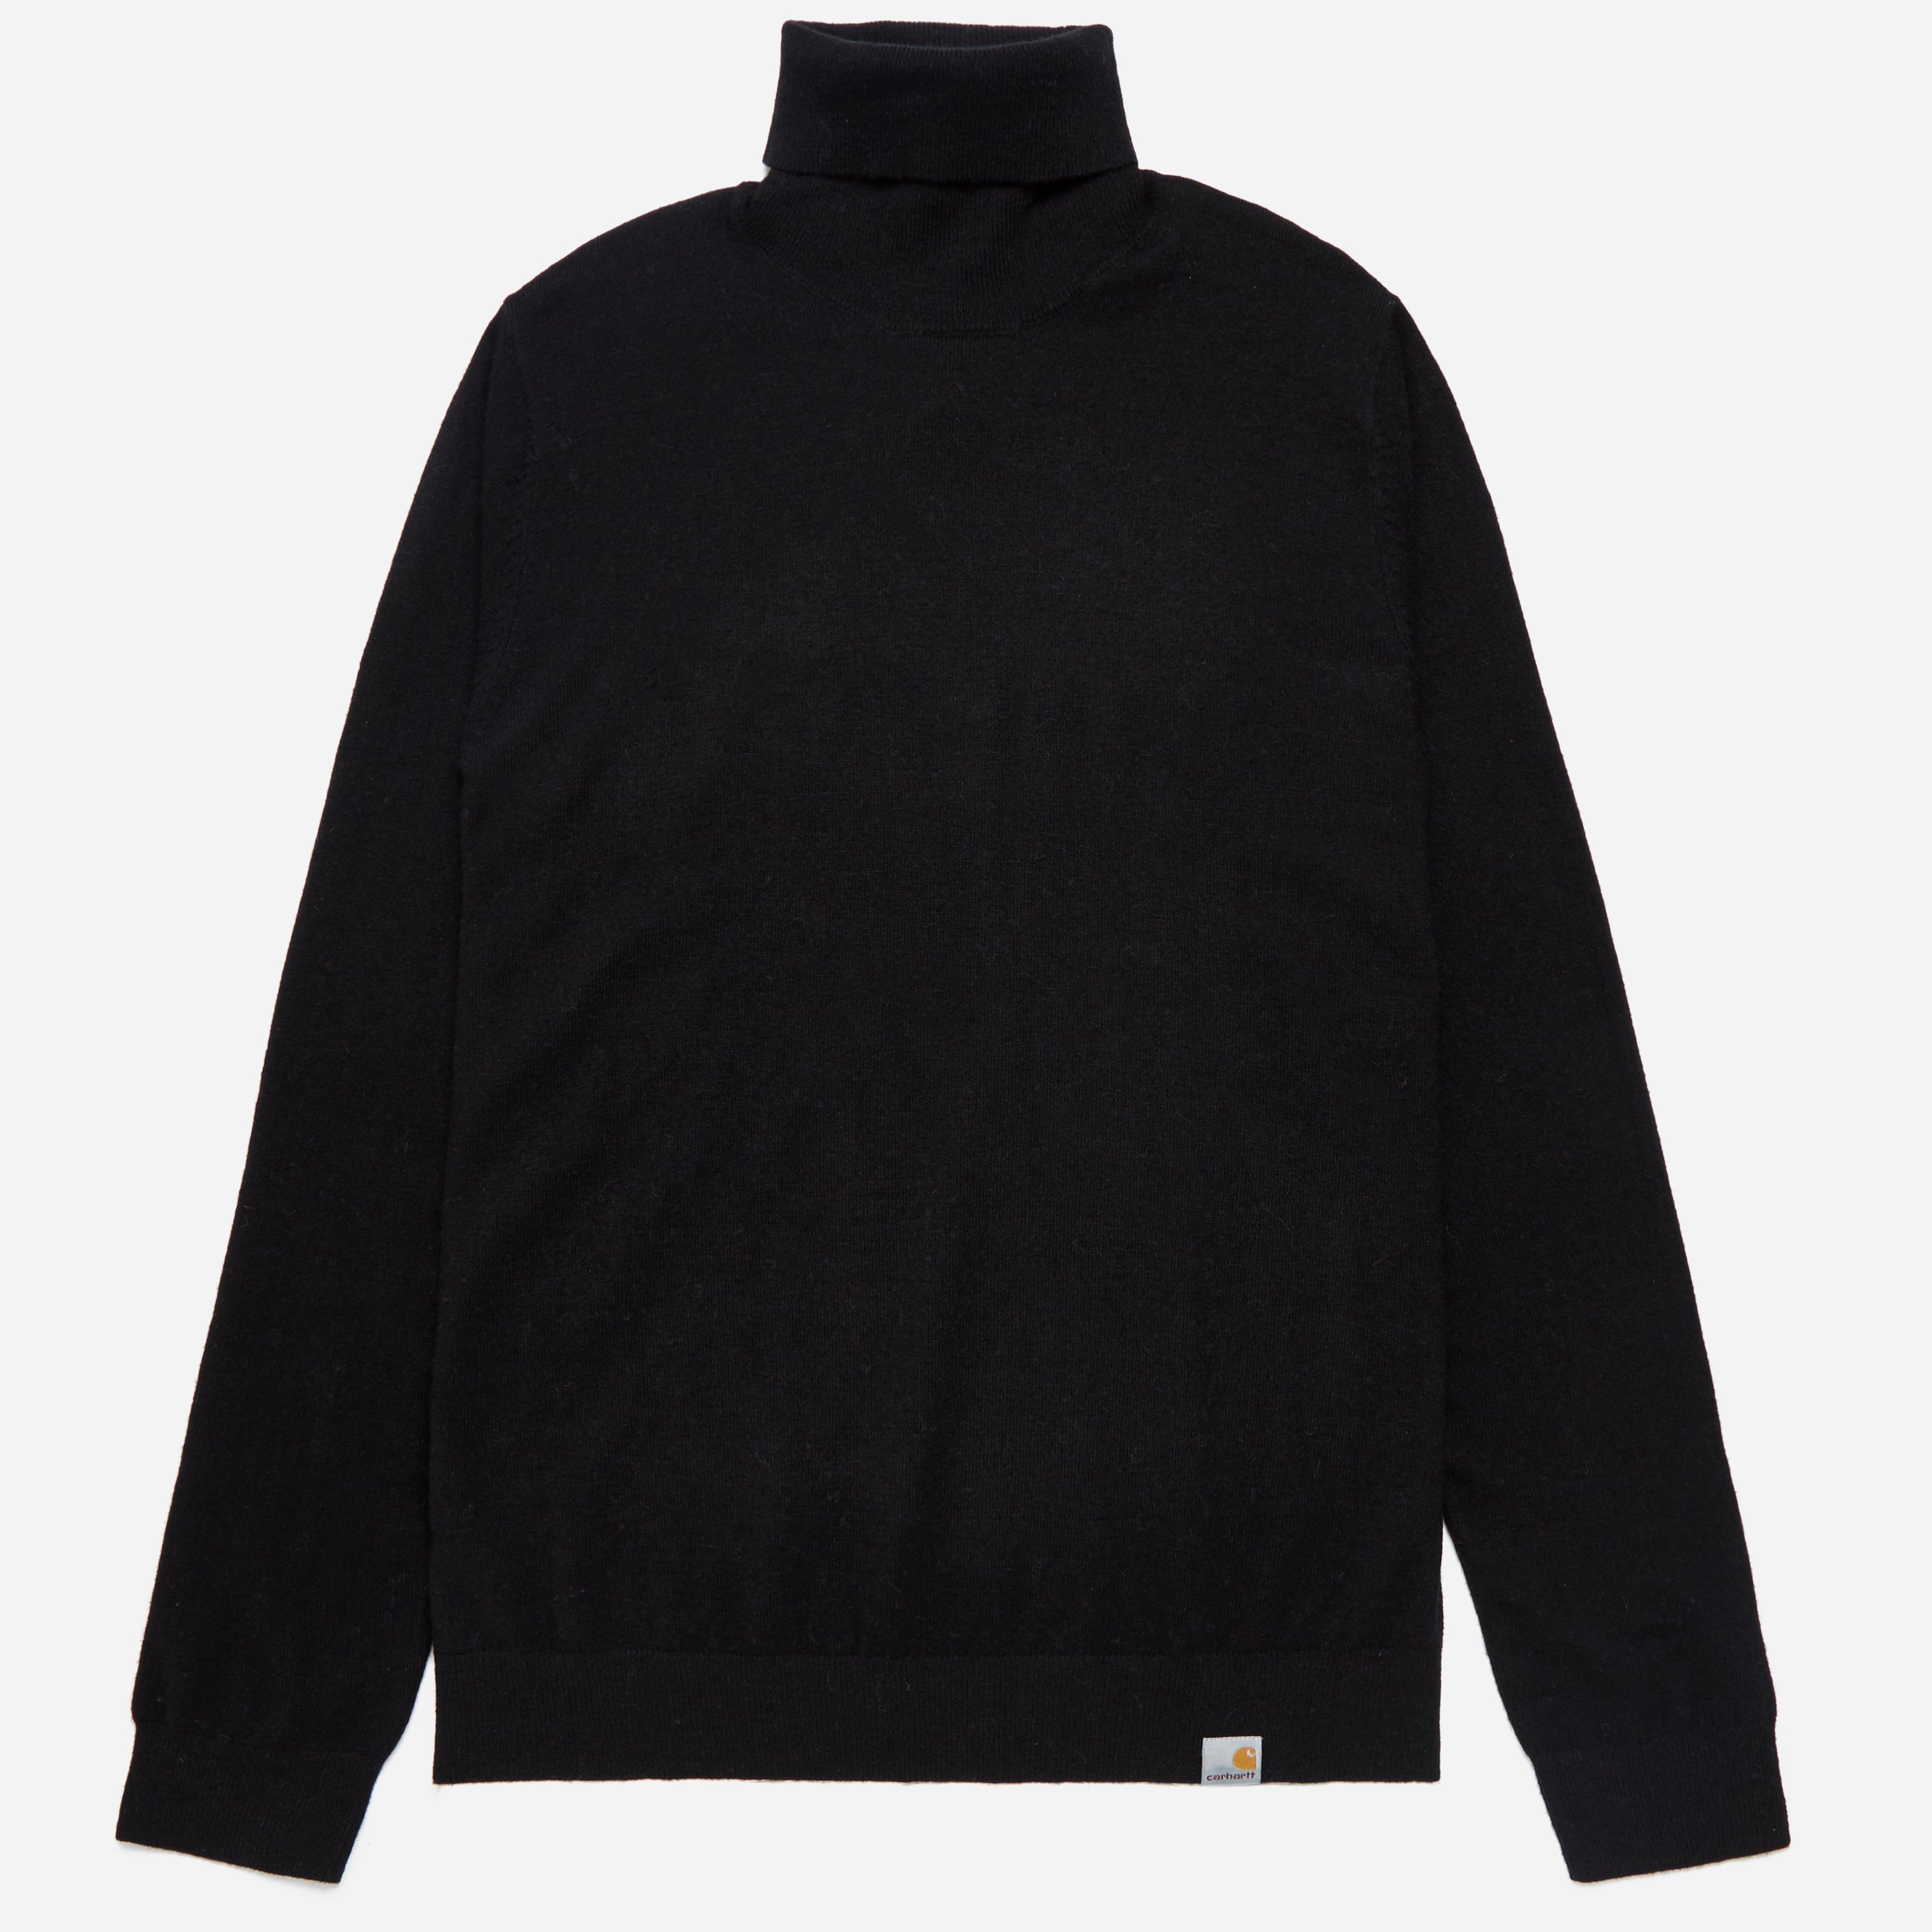 Carhartt Playoff Turtleneck Sweatshirt